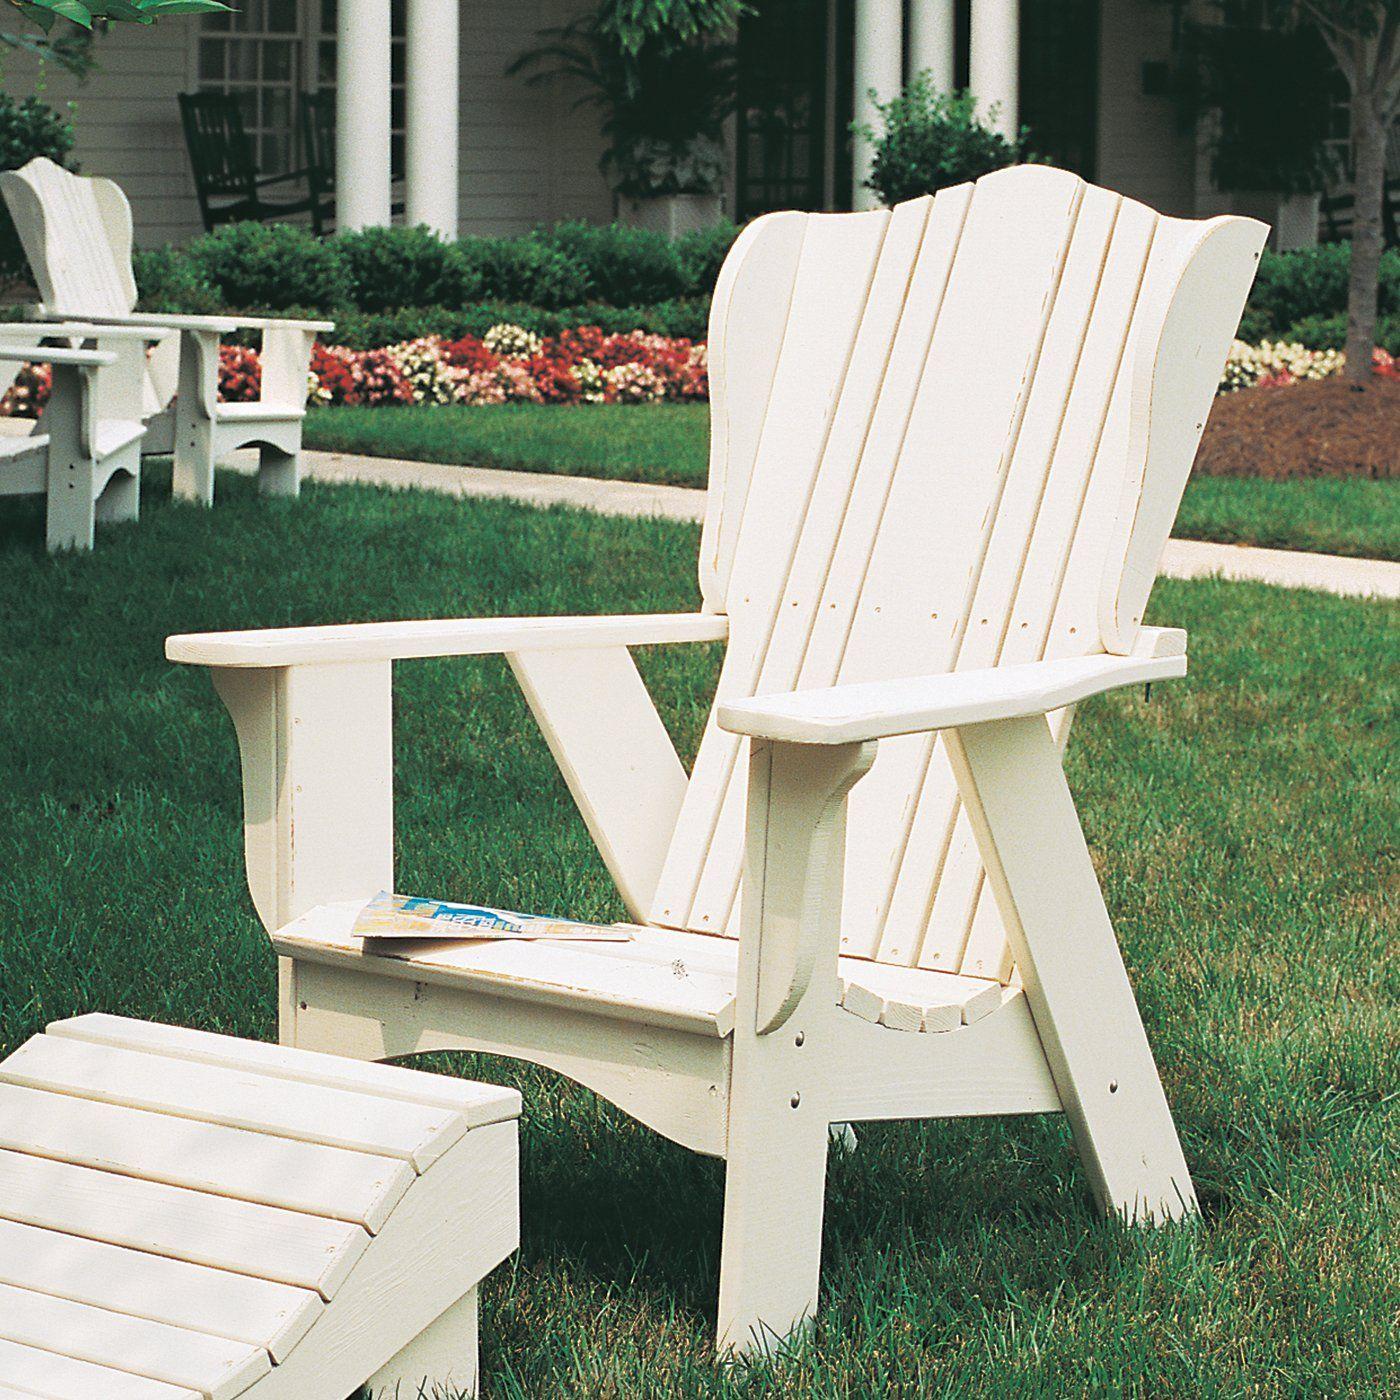 Uwharrie Chair 3011 0 Plantation Adirondack Chair   Outdoor Living Showroom